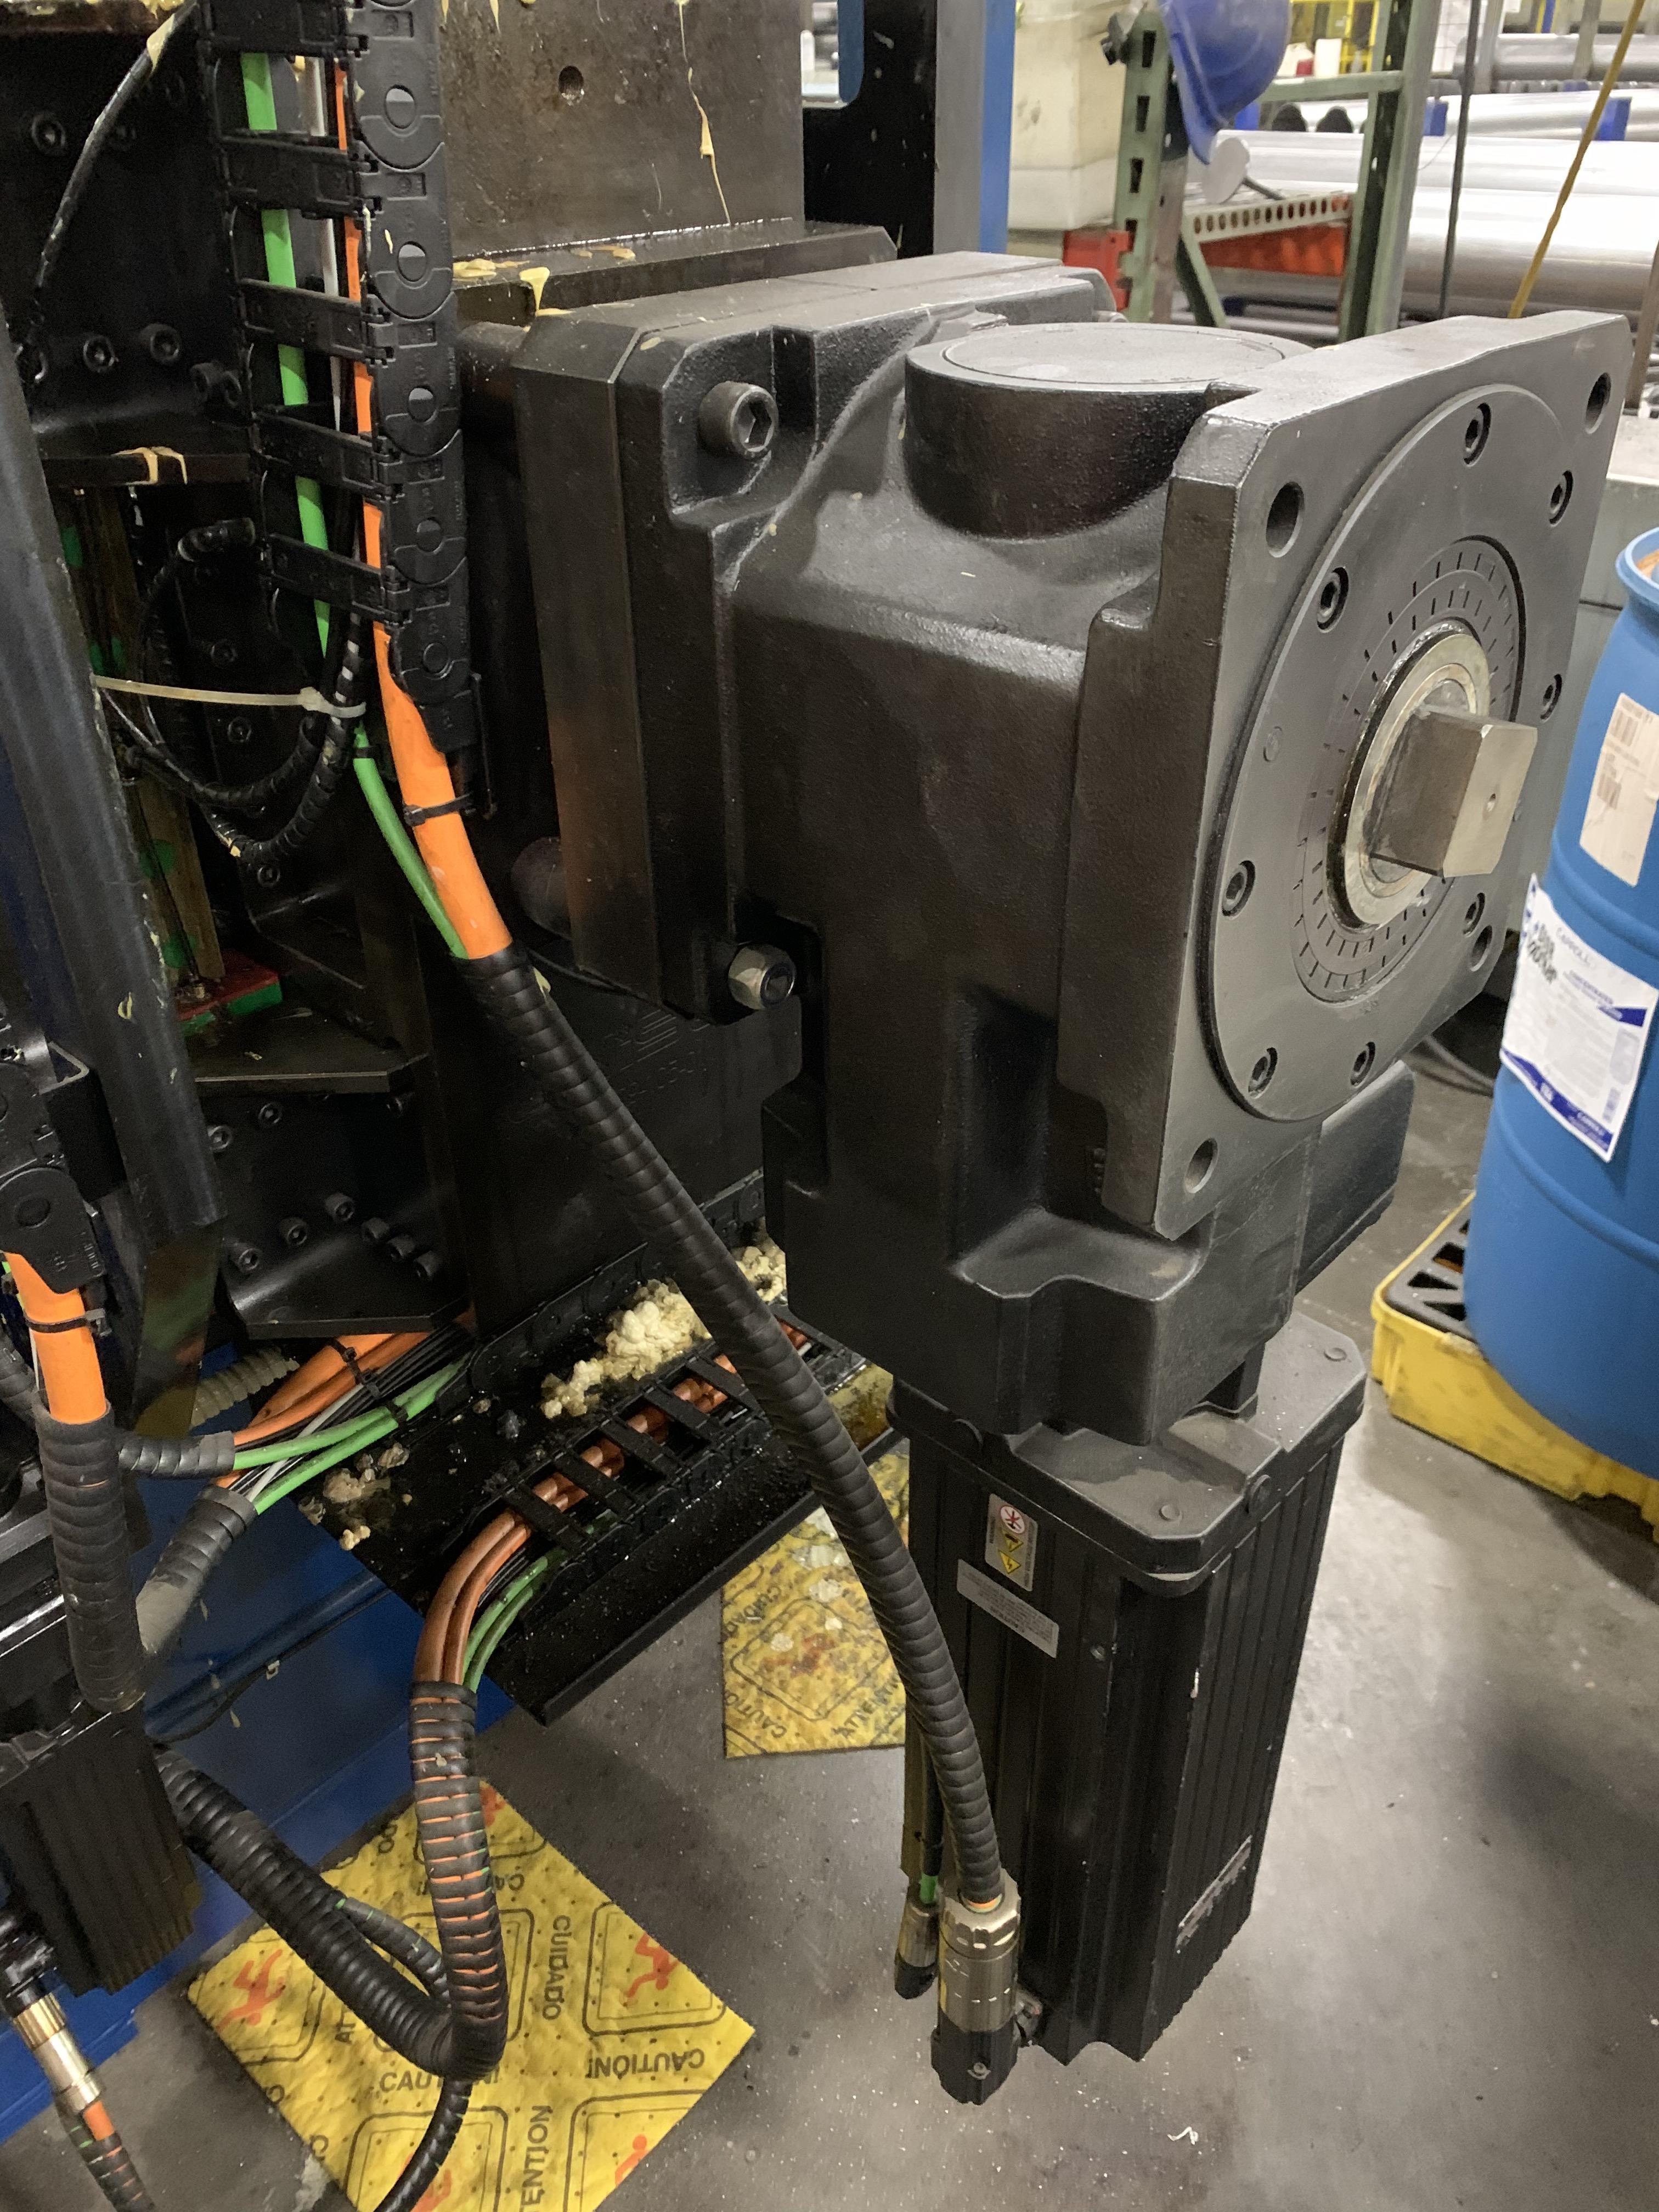 "6"" UNISON MODEL 6"" MS RH ELECTRIC CNC MULTI-STACK TUBE BENDER; S/N 2715, JOB NO. ME 4-410,(NEW 2014) - Image 35 of 72"